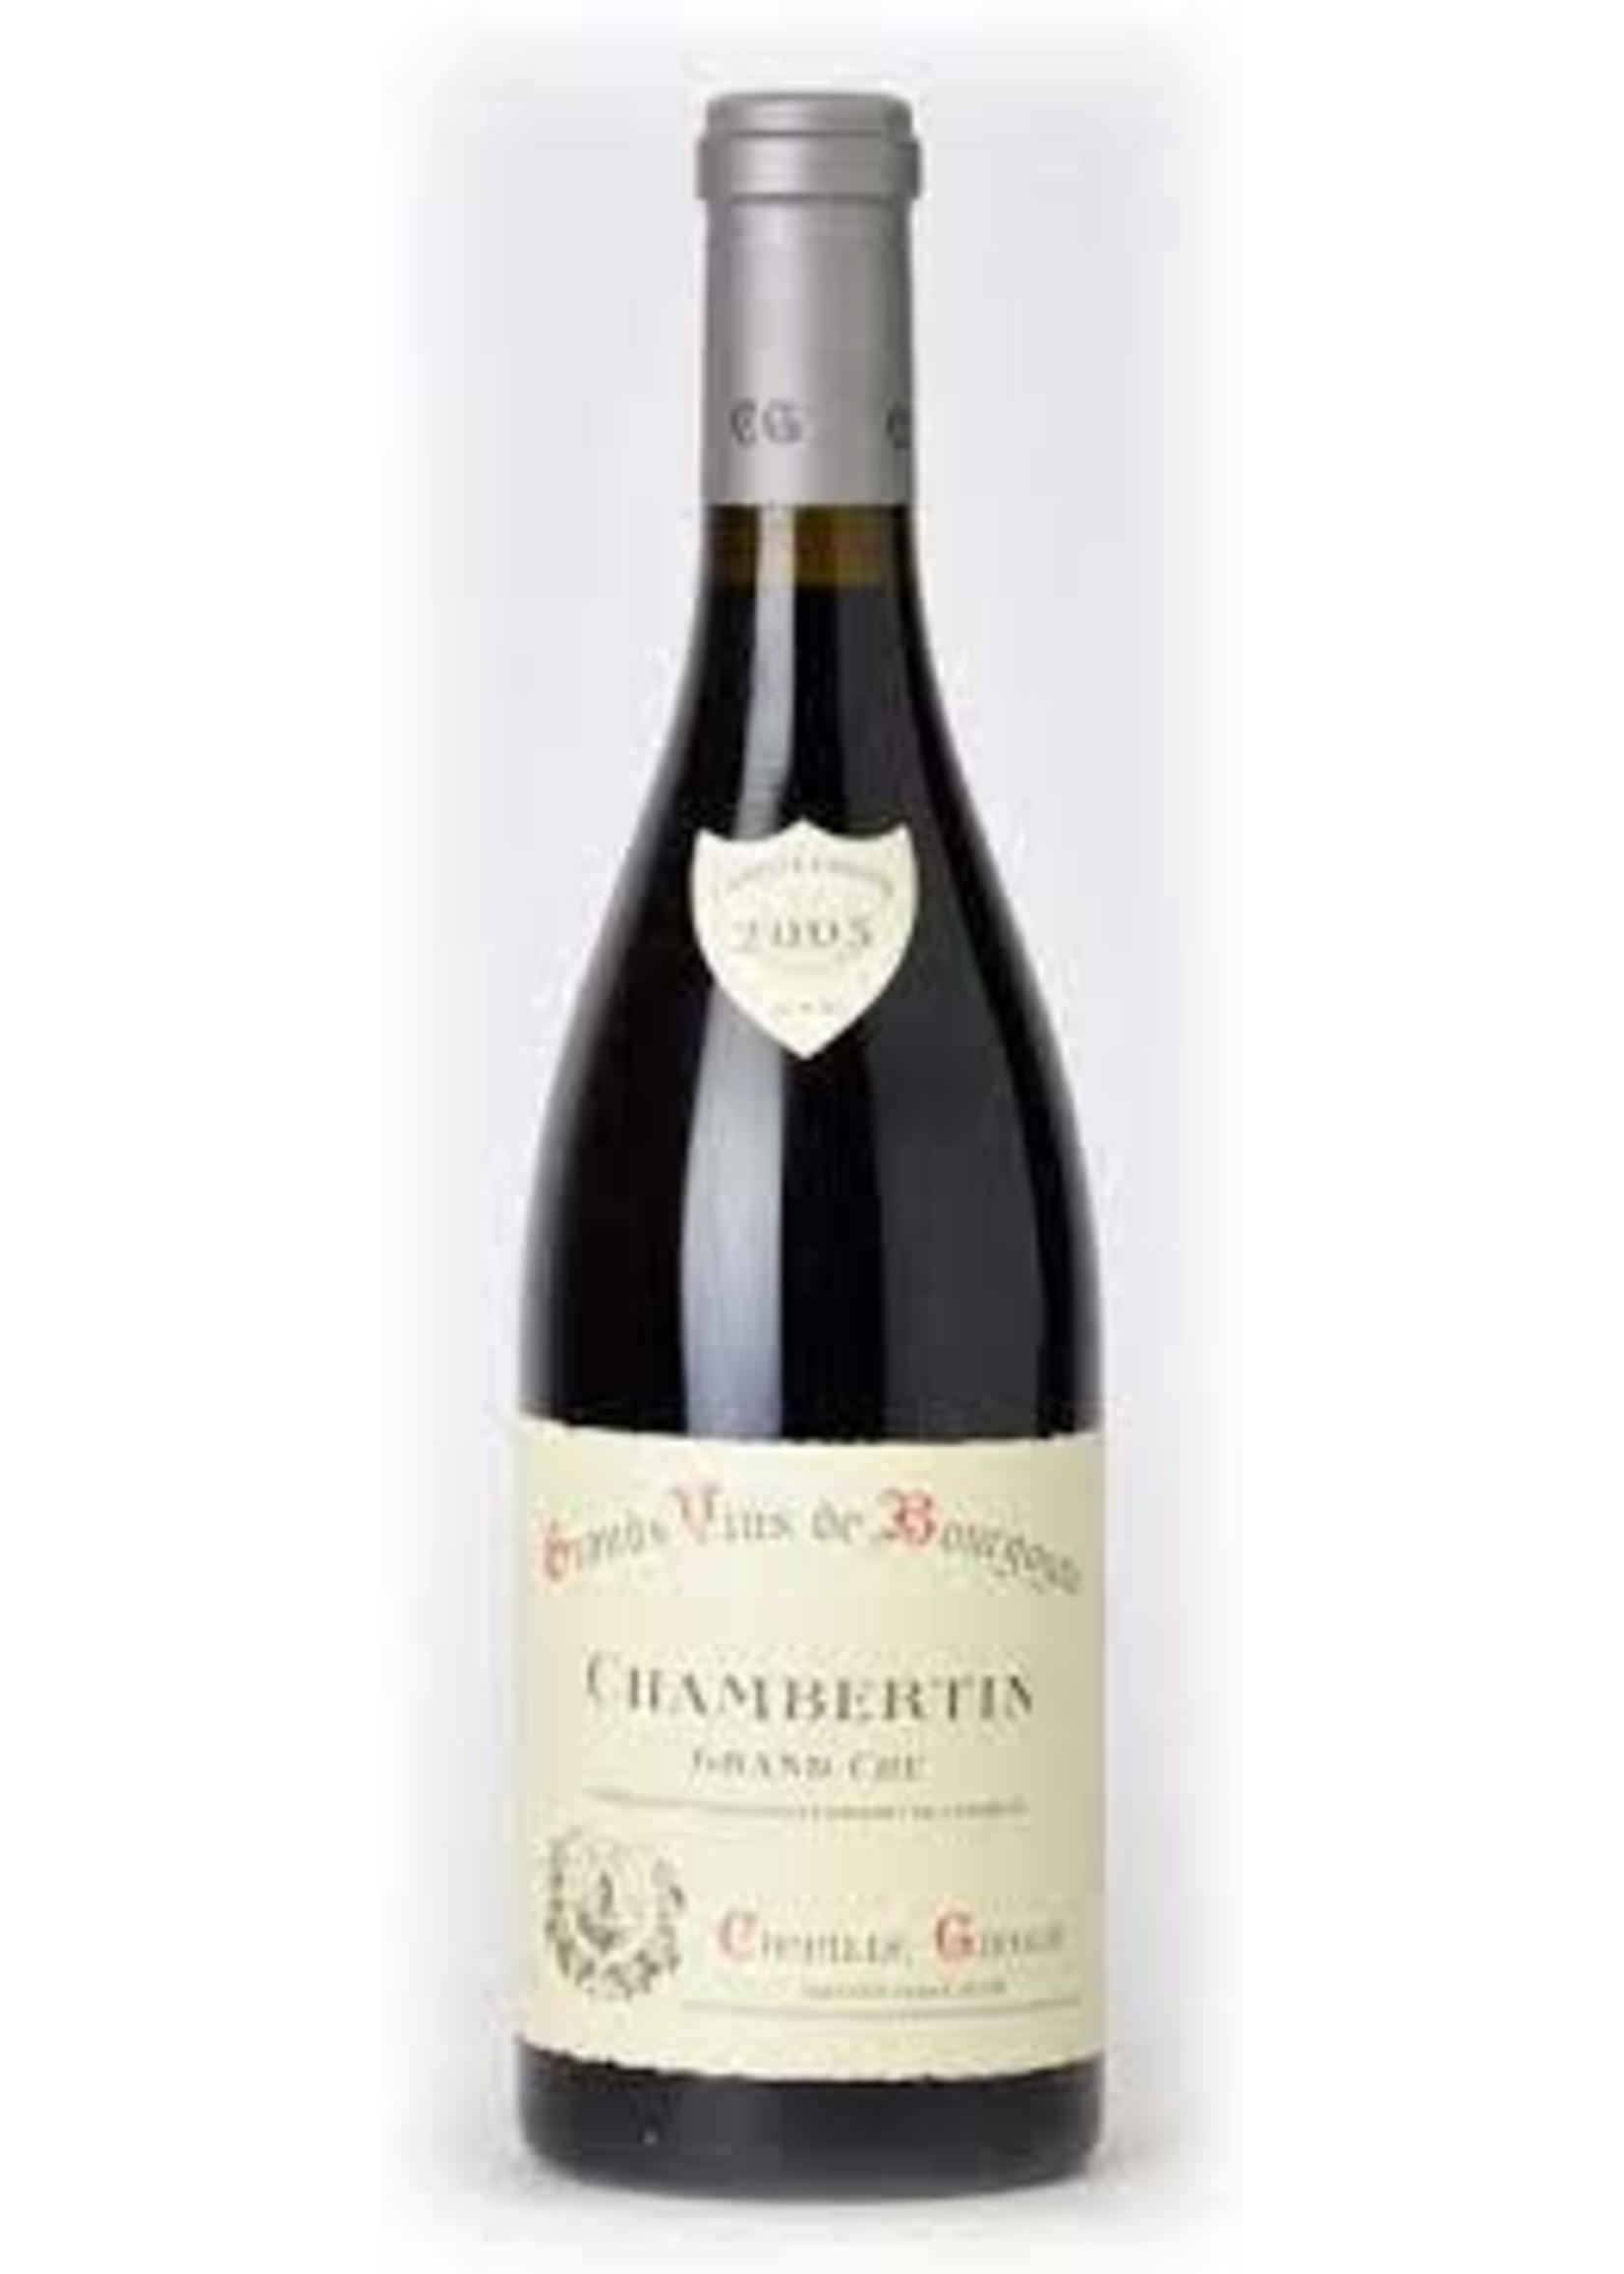 Camille Giroud 2005 Chambertin Grand Cru 750ml [PRE-ARRIVAL]